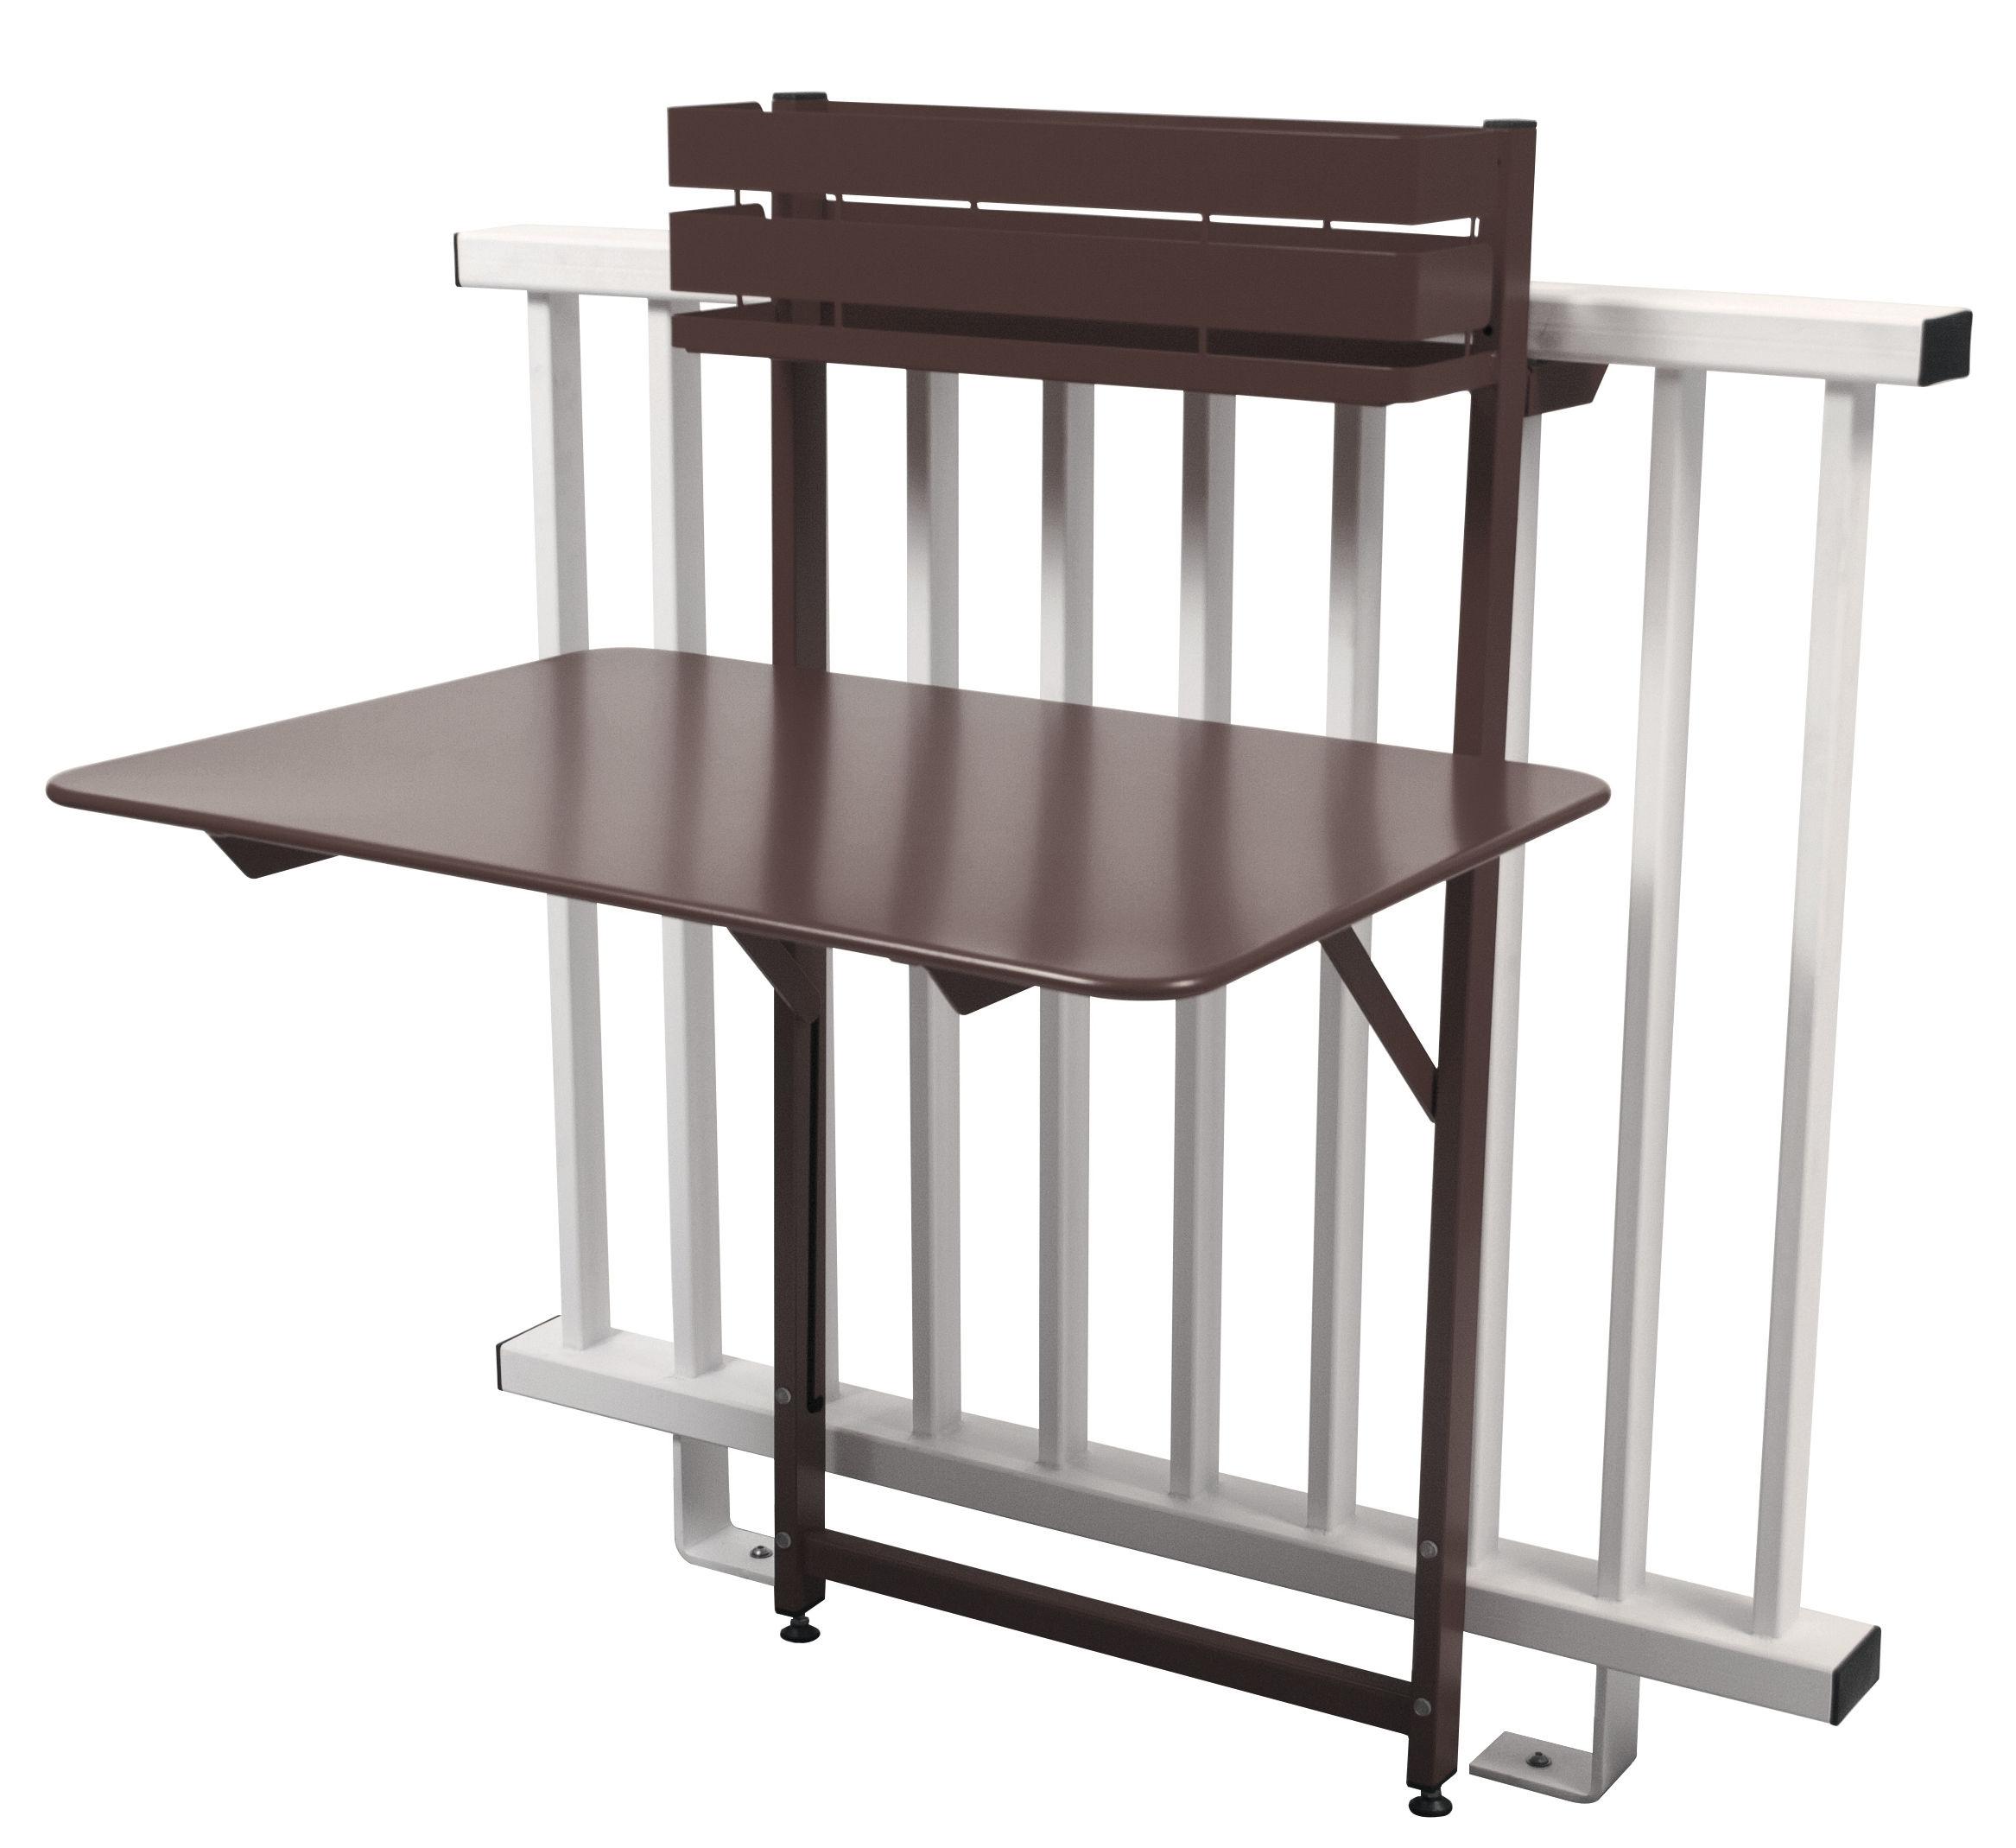 table pliante balcon bistro rabattable 77 x 64 cm rouille fermob. Black Bedroom Furniture Sets. Home Design Ideas